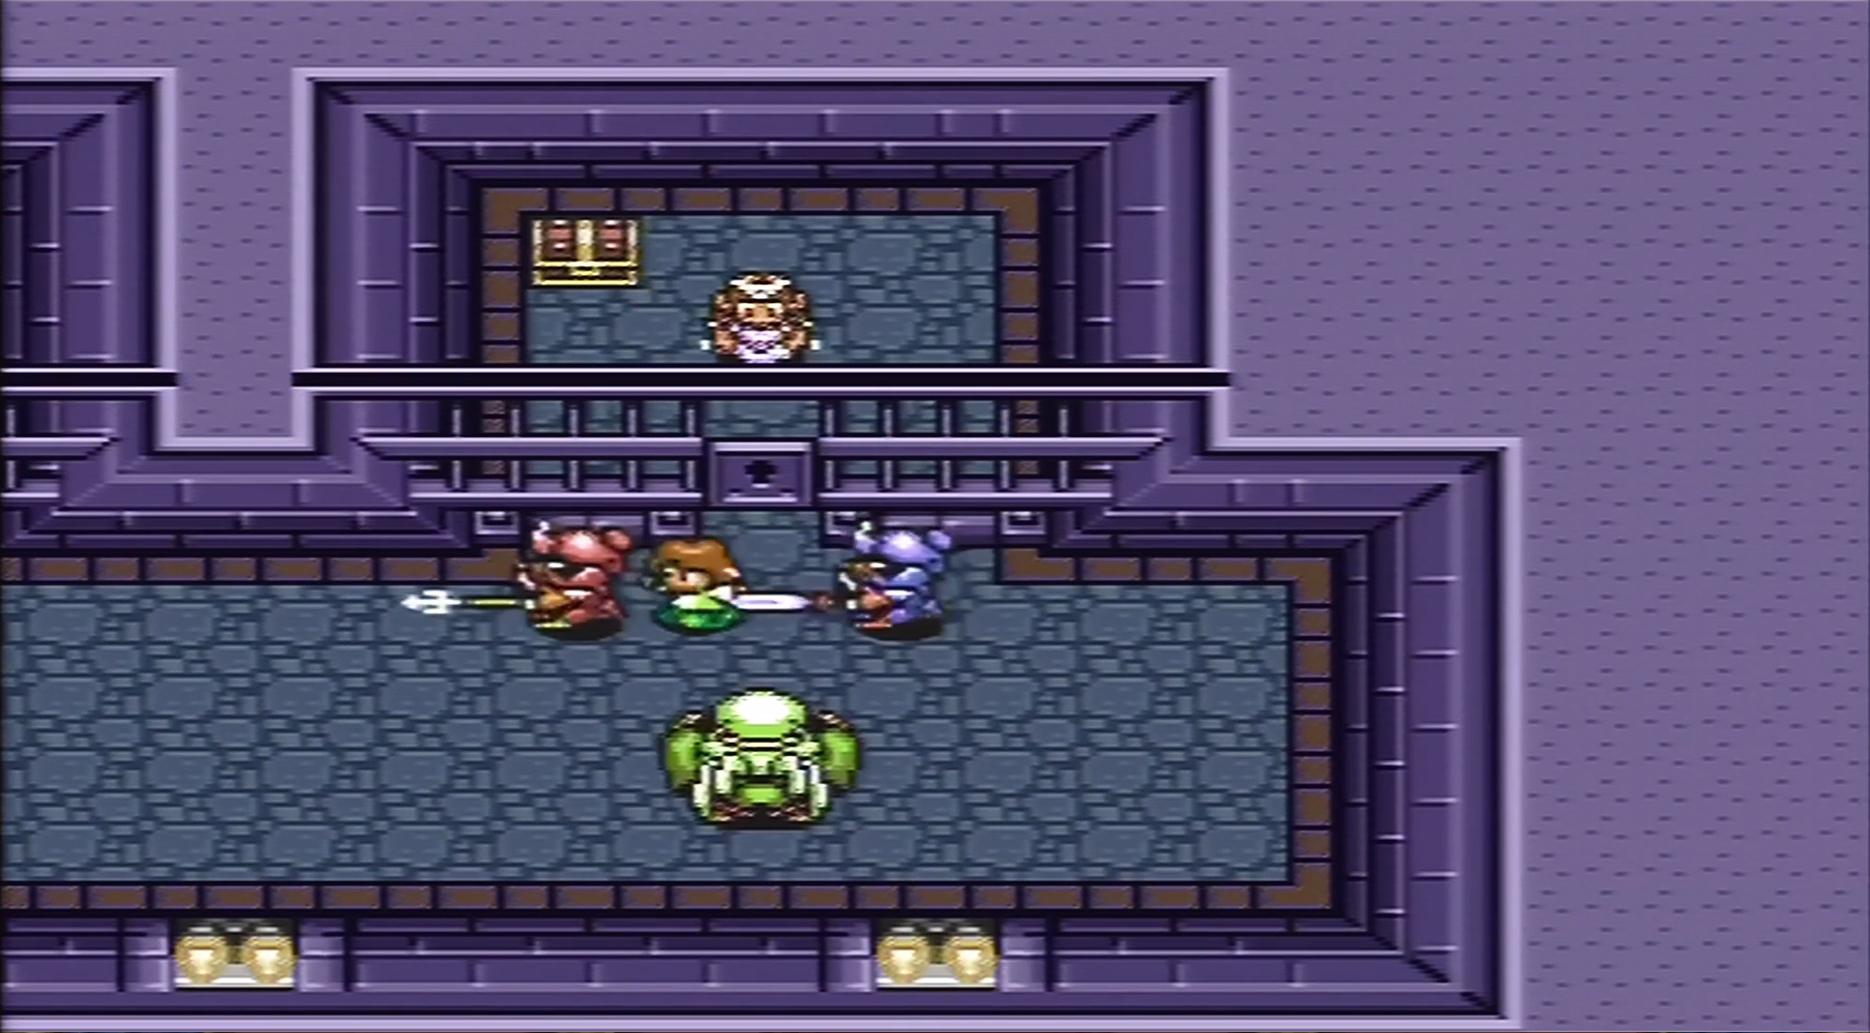 Copy of Legend of Zelda: RCA upscaled to 1080p